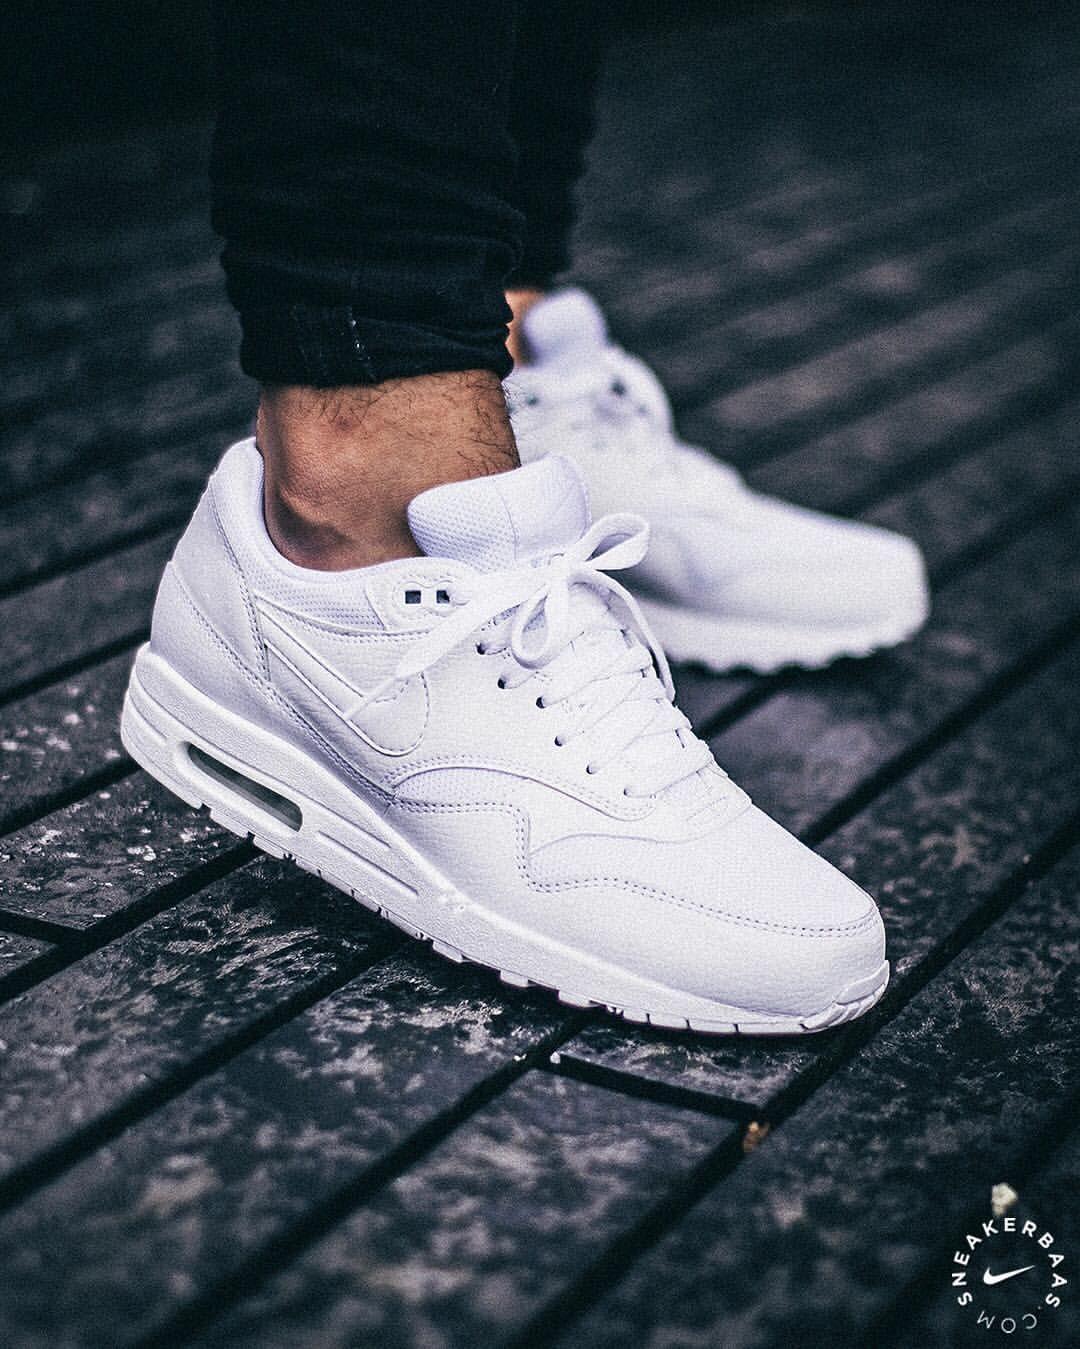 cheap for discount db505 8debe Nike Air Max 1 Premium Triple White  sneakers  sneakernews  StreetStyle   Kicks  adidas  nike  vans  newbalance  puma  ADIDAS  ASICS  CONVERSE   DIADORA ...